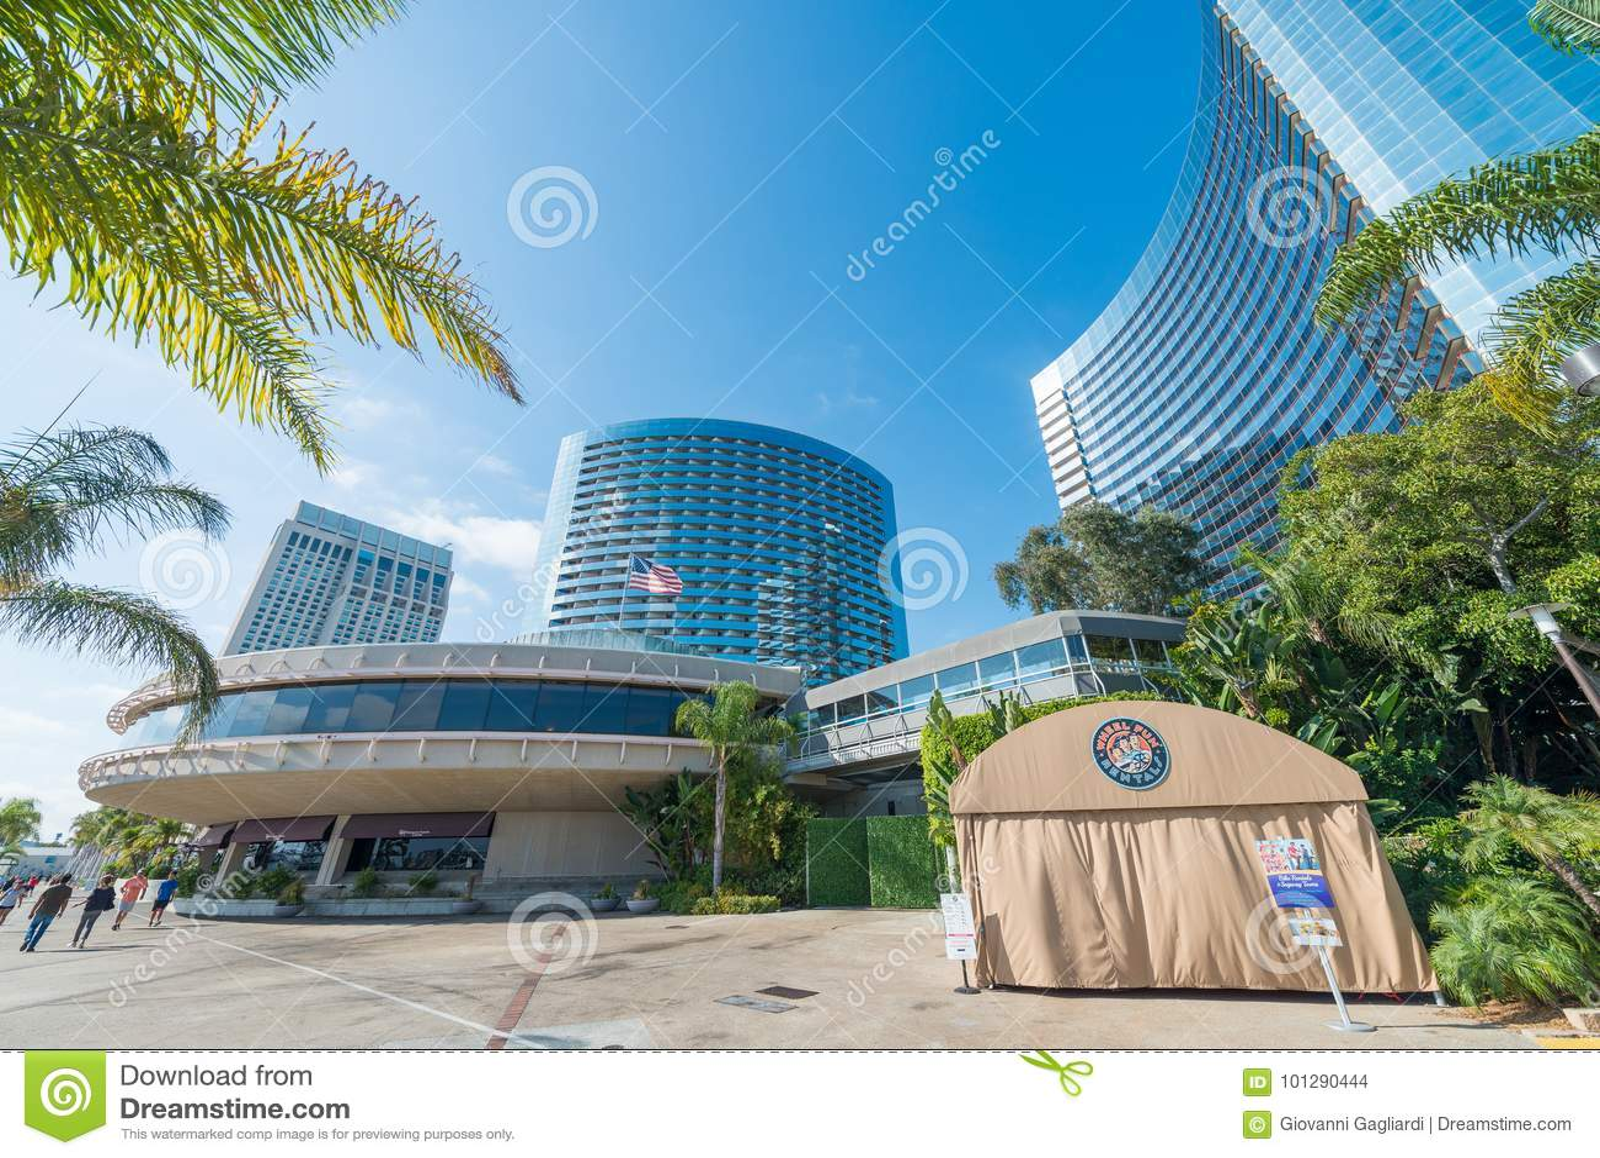 SAN DIEGO - JULY 29, 2017: Modern buildings of San Diego skyline